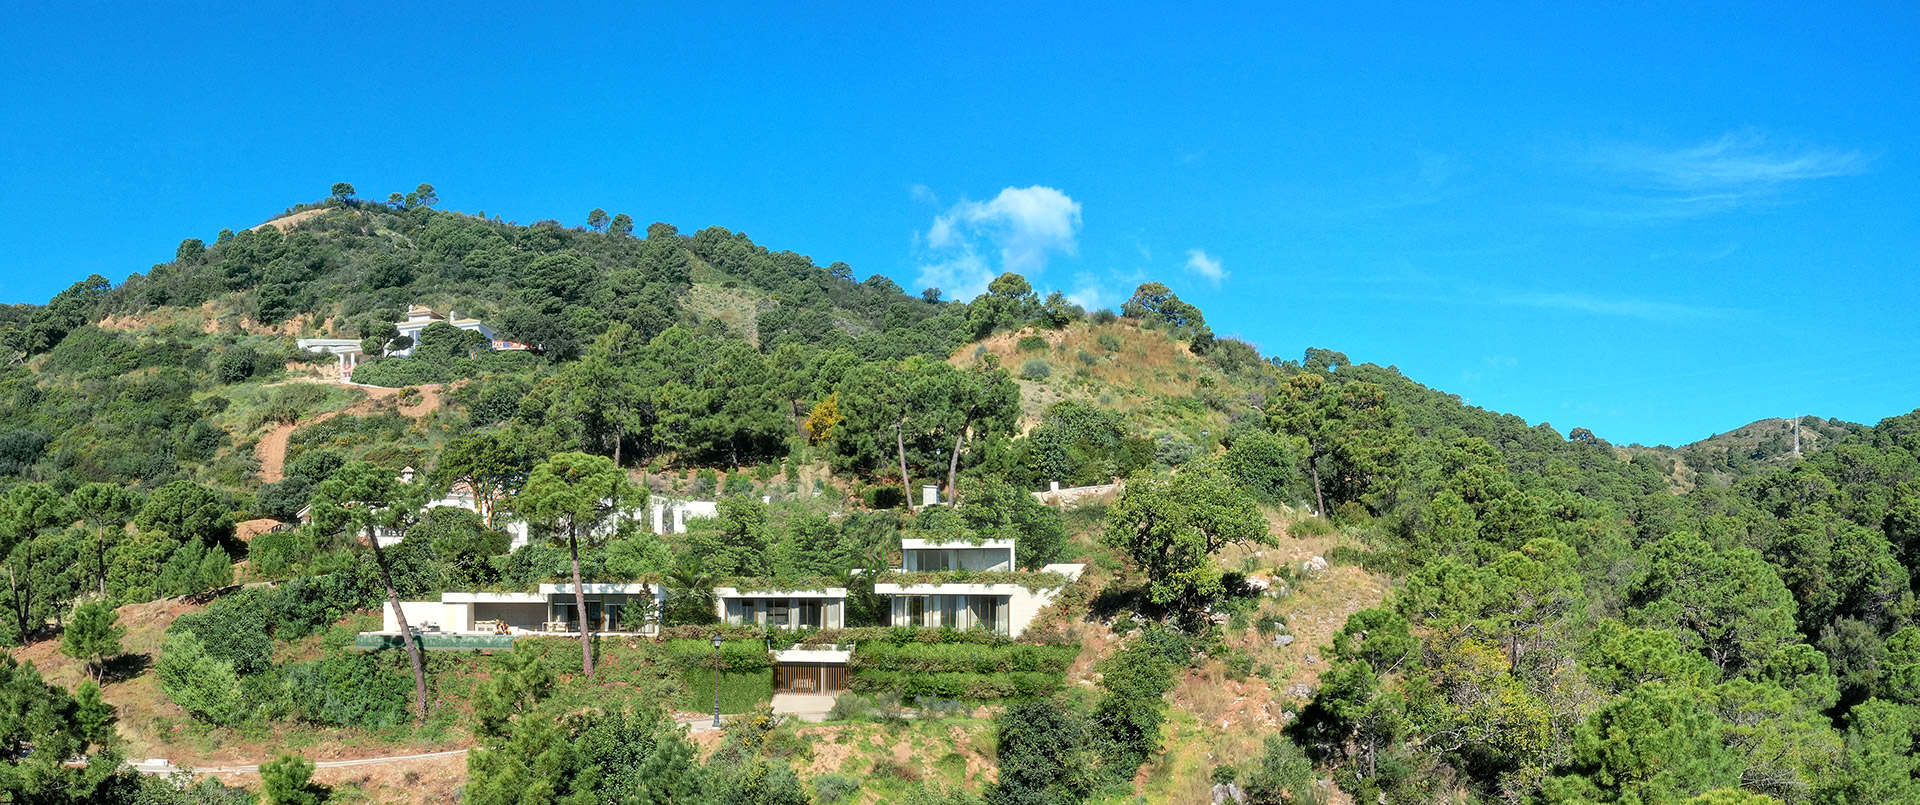 Villa-Monte-Mayor-K7-Pic-2